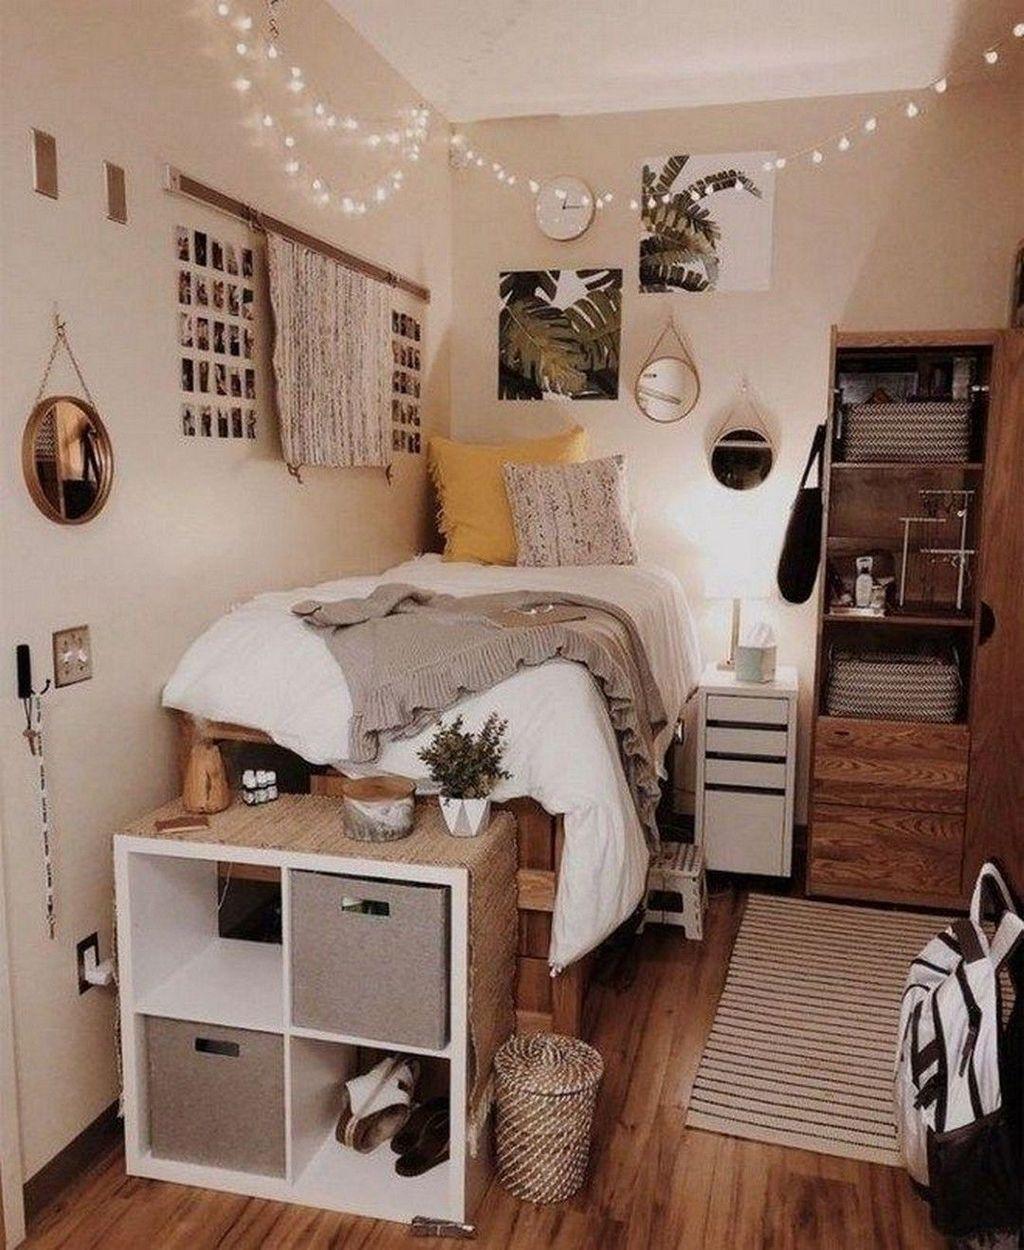 36 Popular Bedroom Organization Ideas To Maximize Your Space College Dorm Room Decor Dorm Room Diy Dorm Room Designs